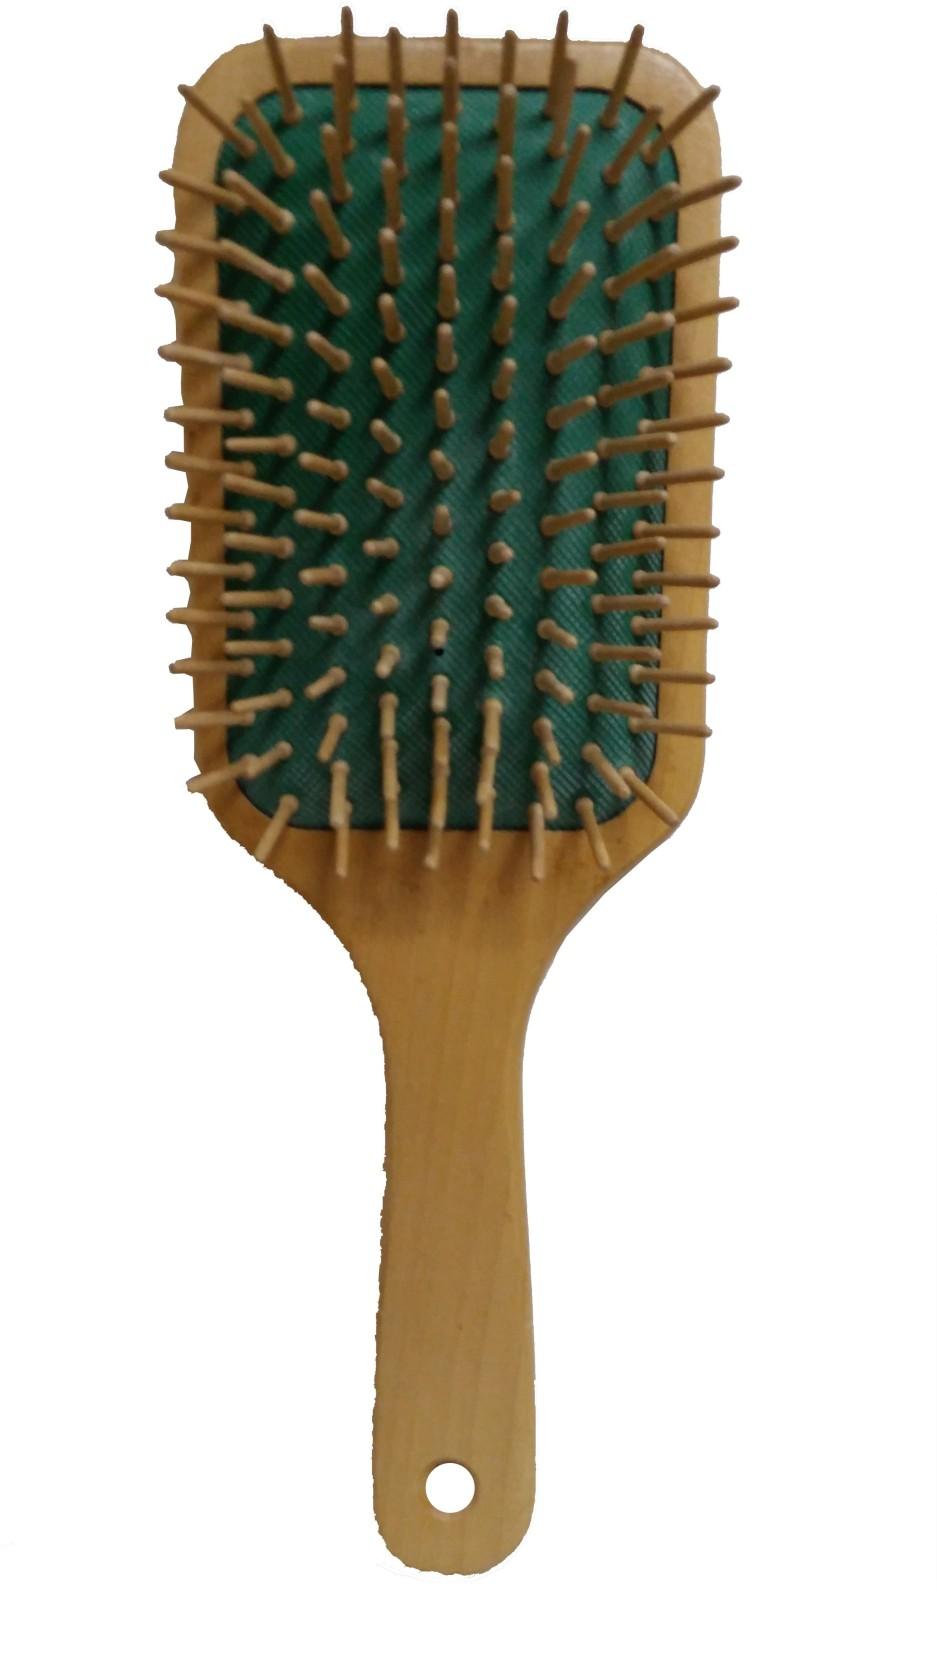 Toni&Guy Wooden-Hair-Paddal-Brushes-With-Wood-Bristles